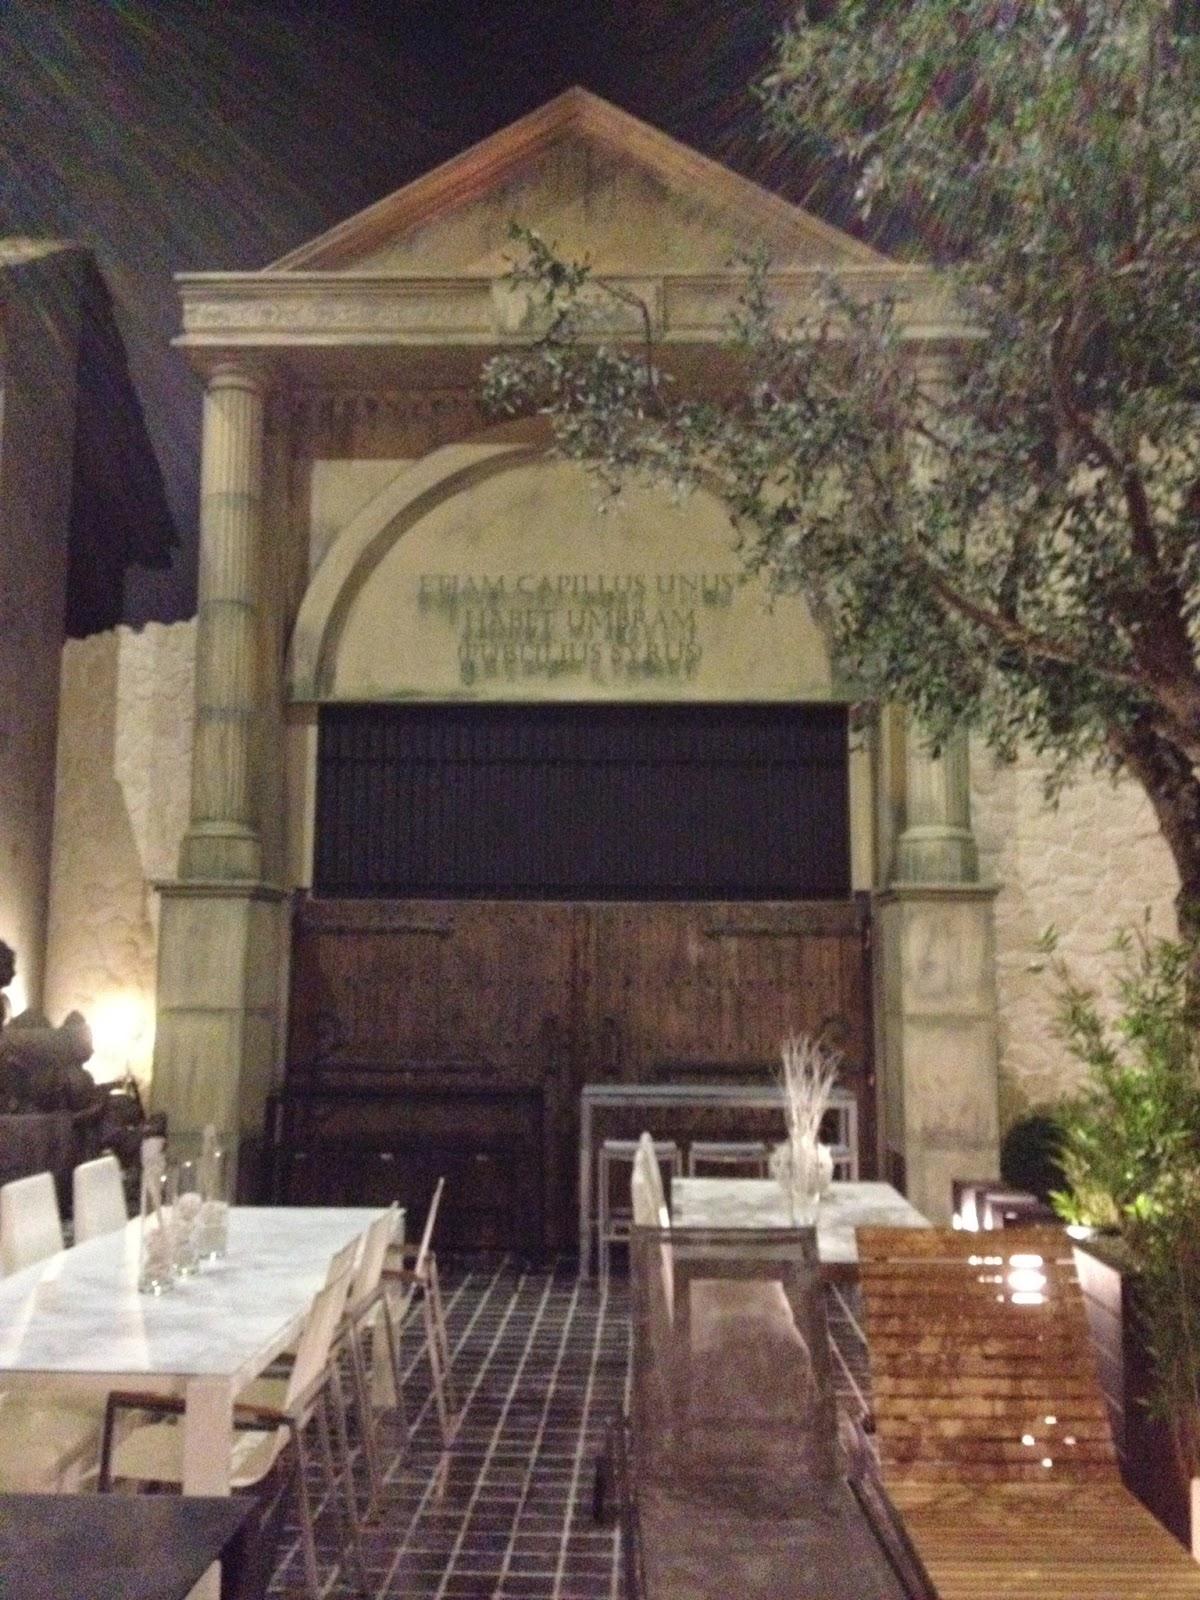 Garcya's place: november 2014